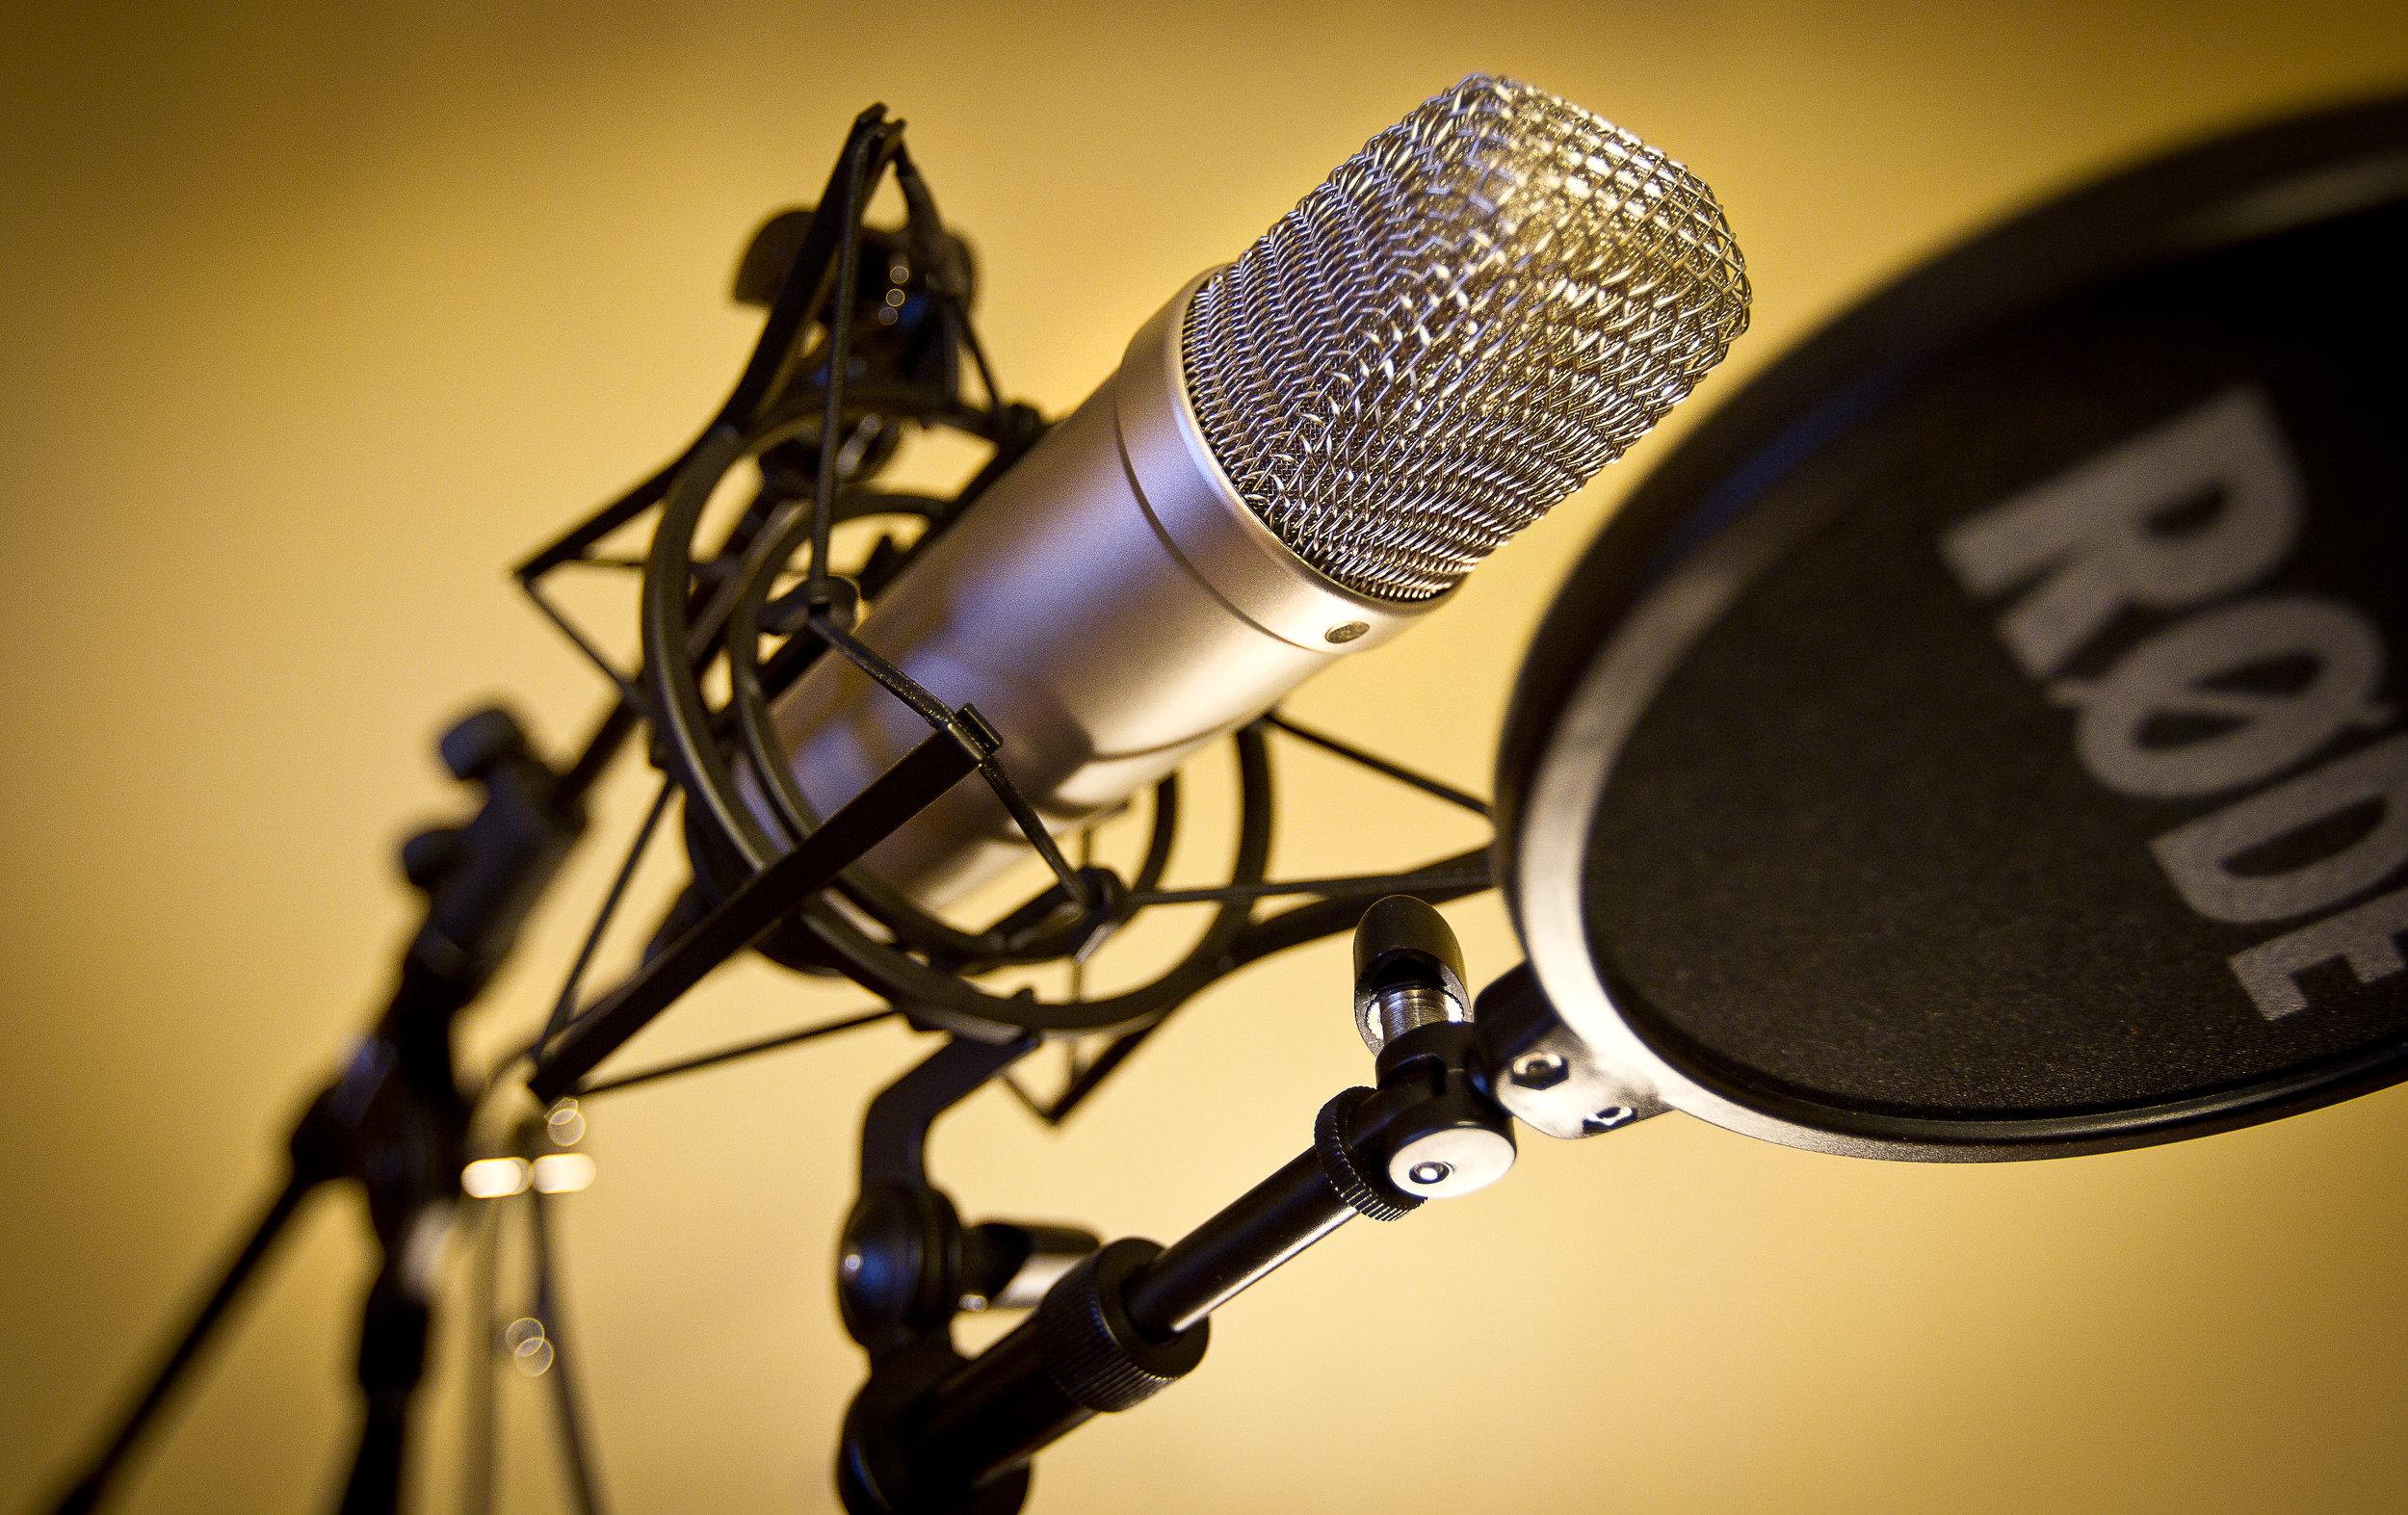 MicrophoneDetail_BB1_9998.jpg